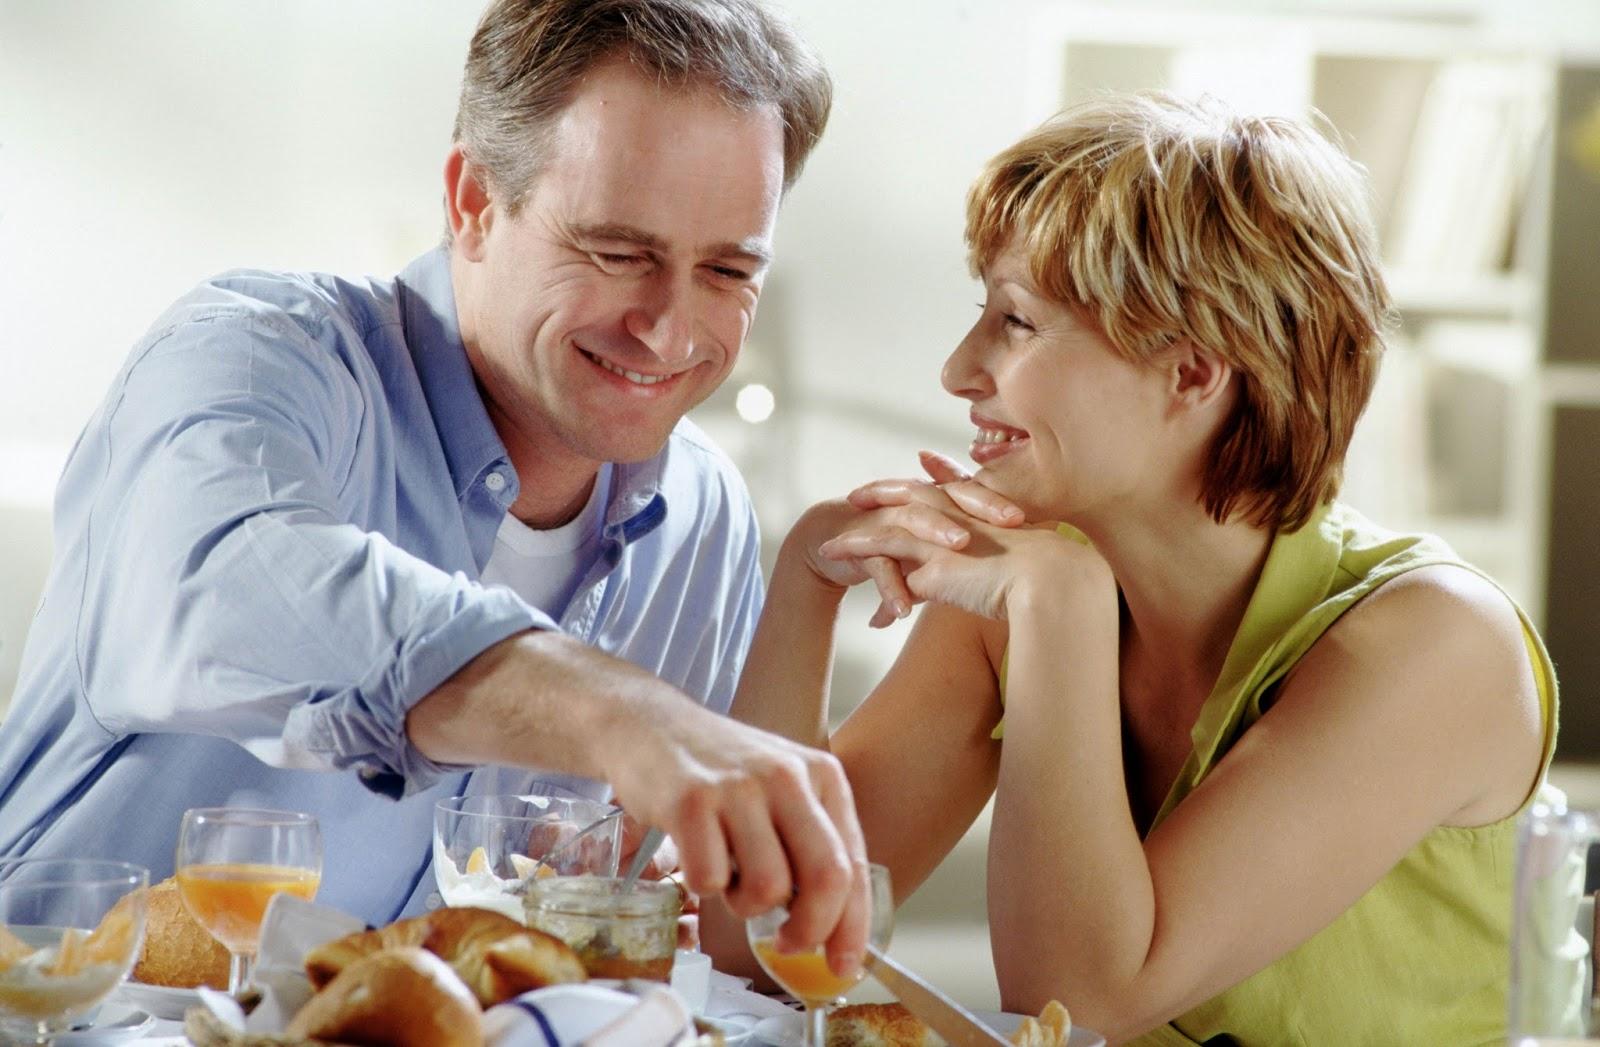 Шепоток чтобы муж жену слушался